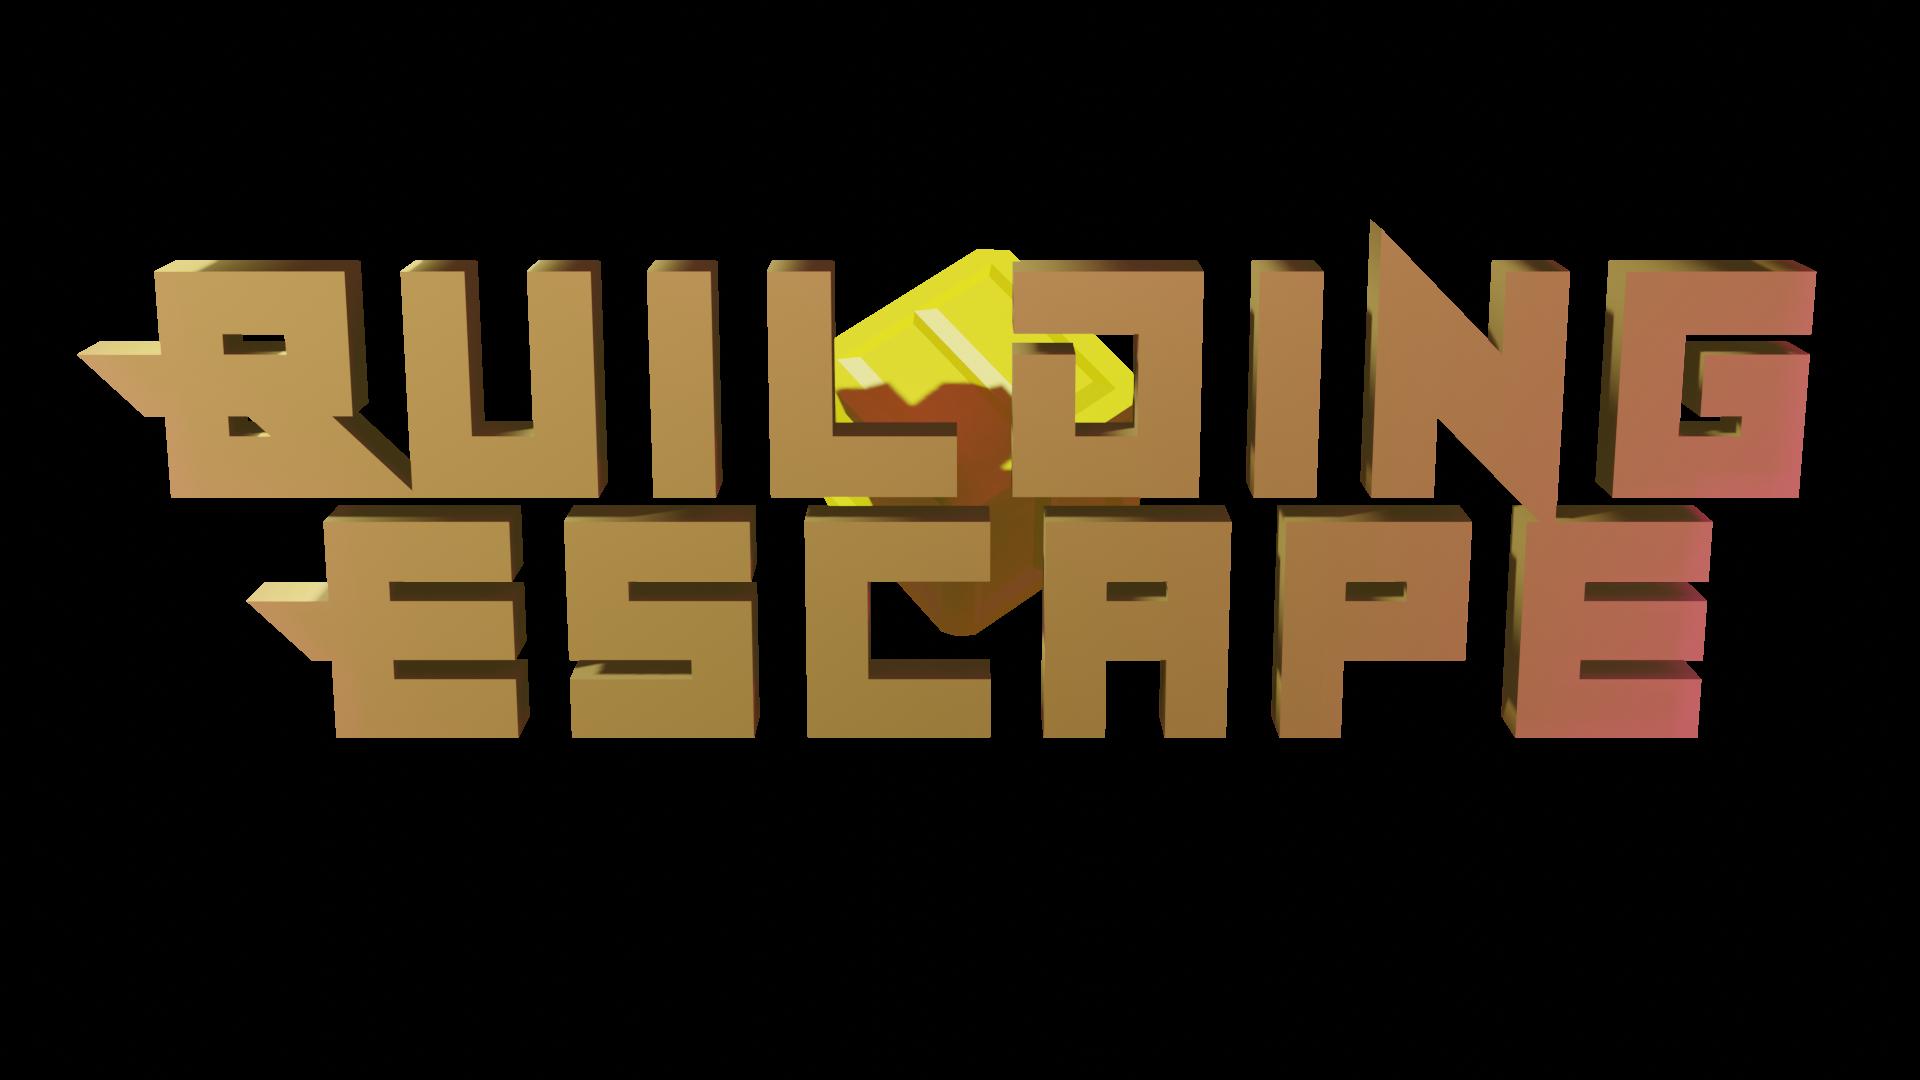 Building Escapes